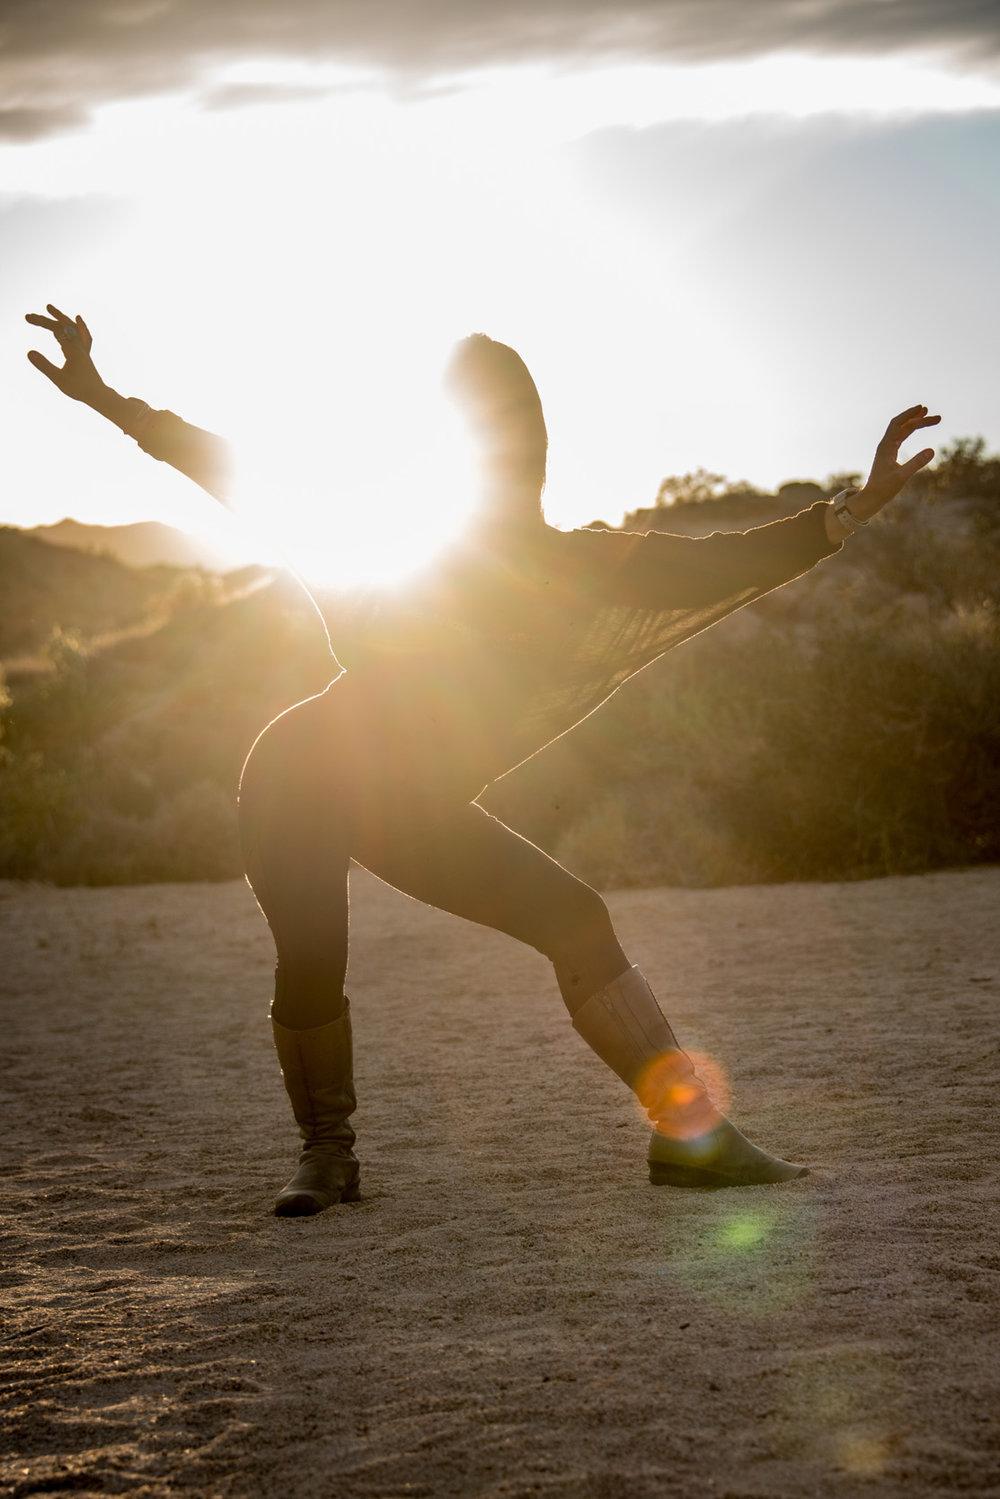 Britt_Nemeth_Studios_PhotographyLive_Events_Elopements_Launches_Ceremony_Gatherings_Yoga_Retreat122.jpg